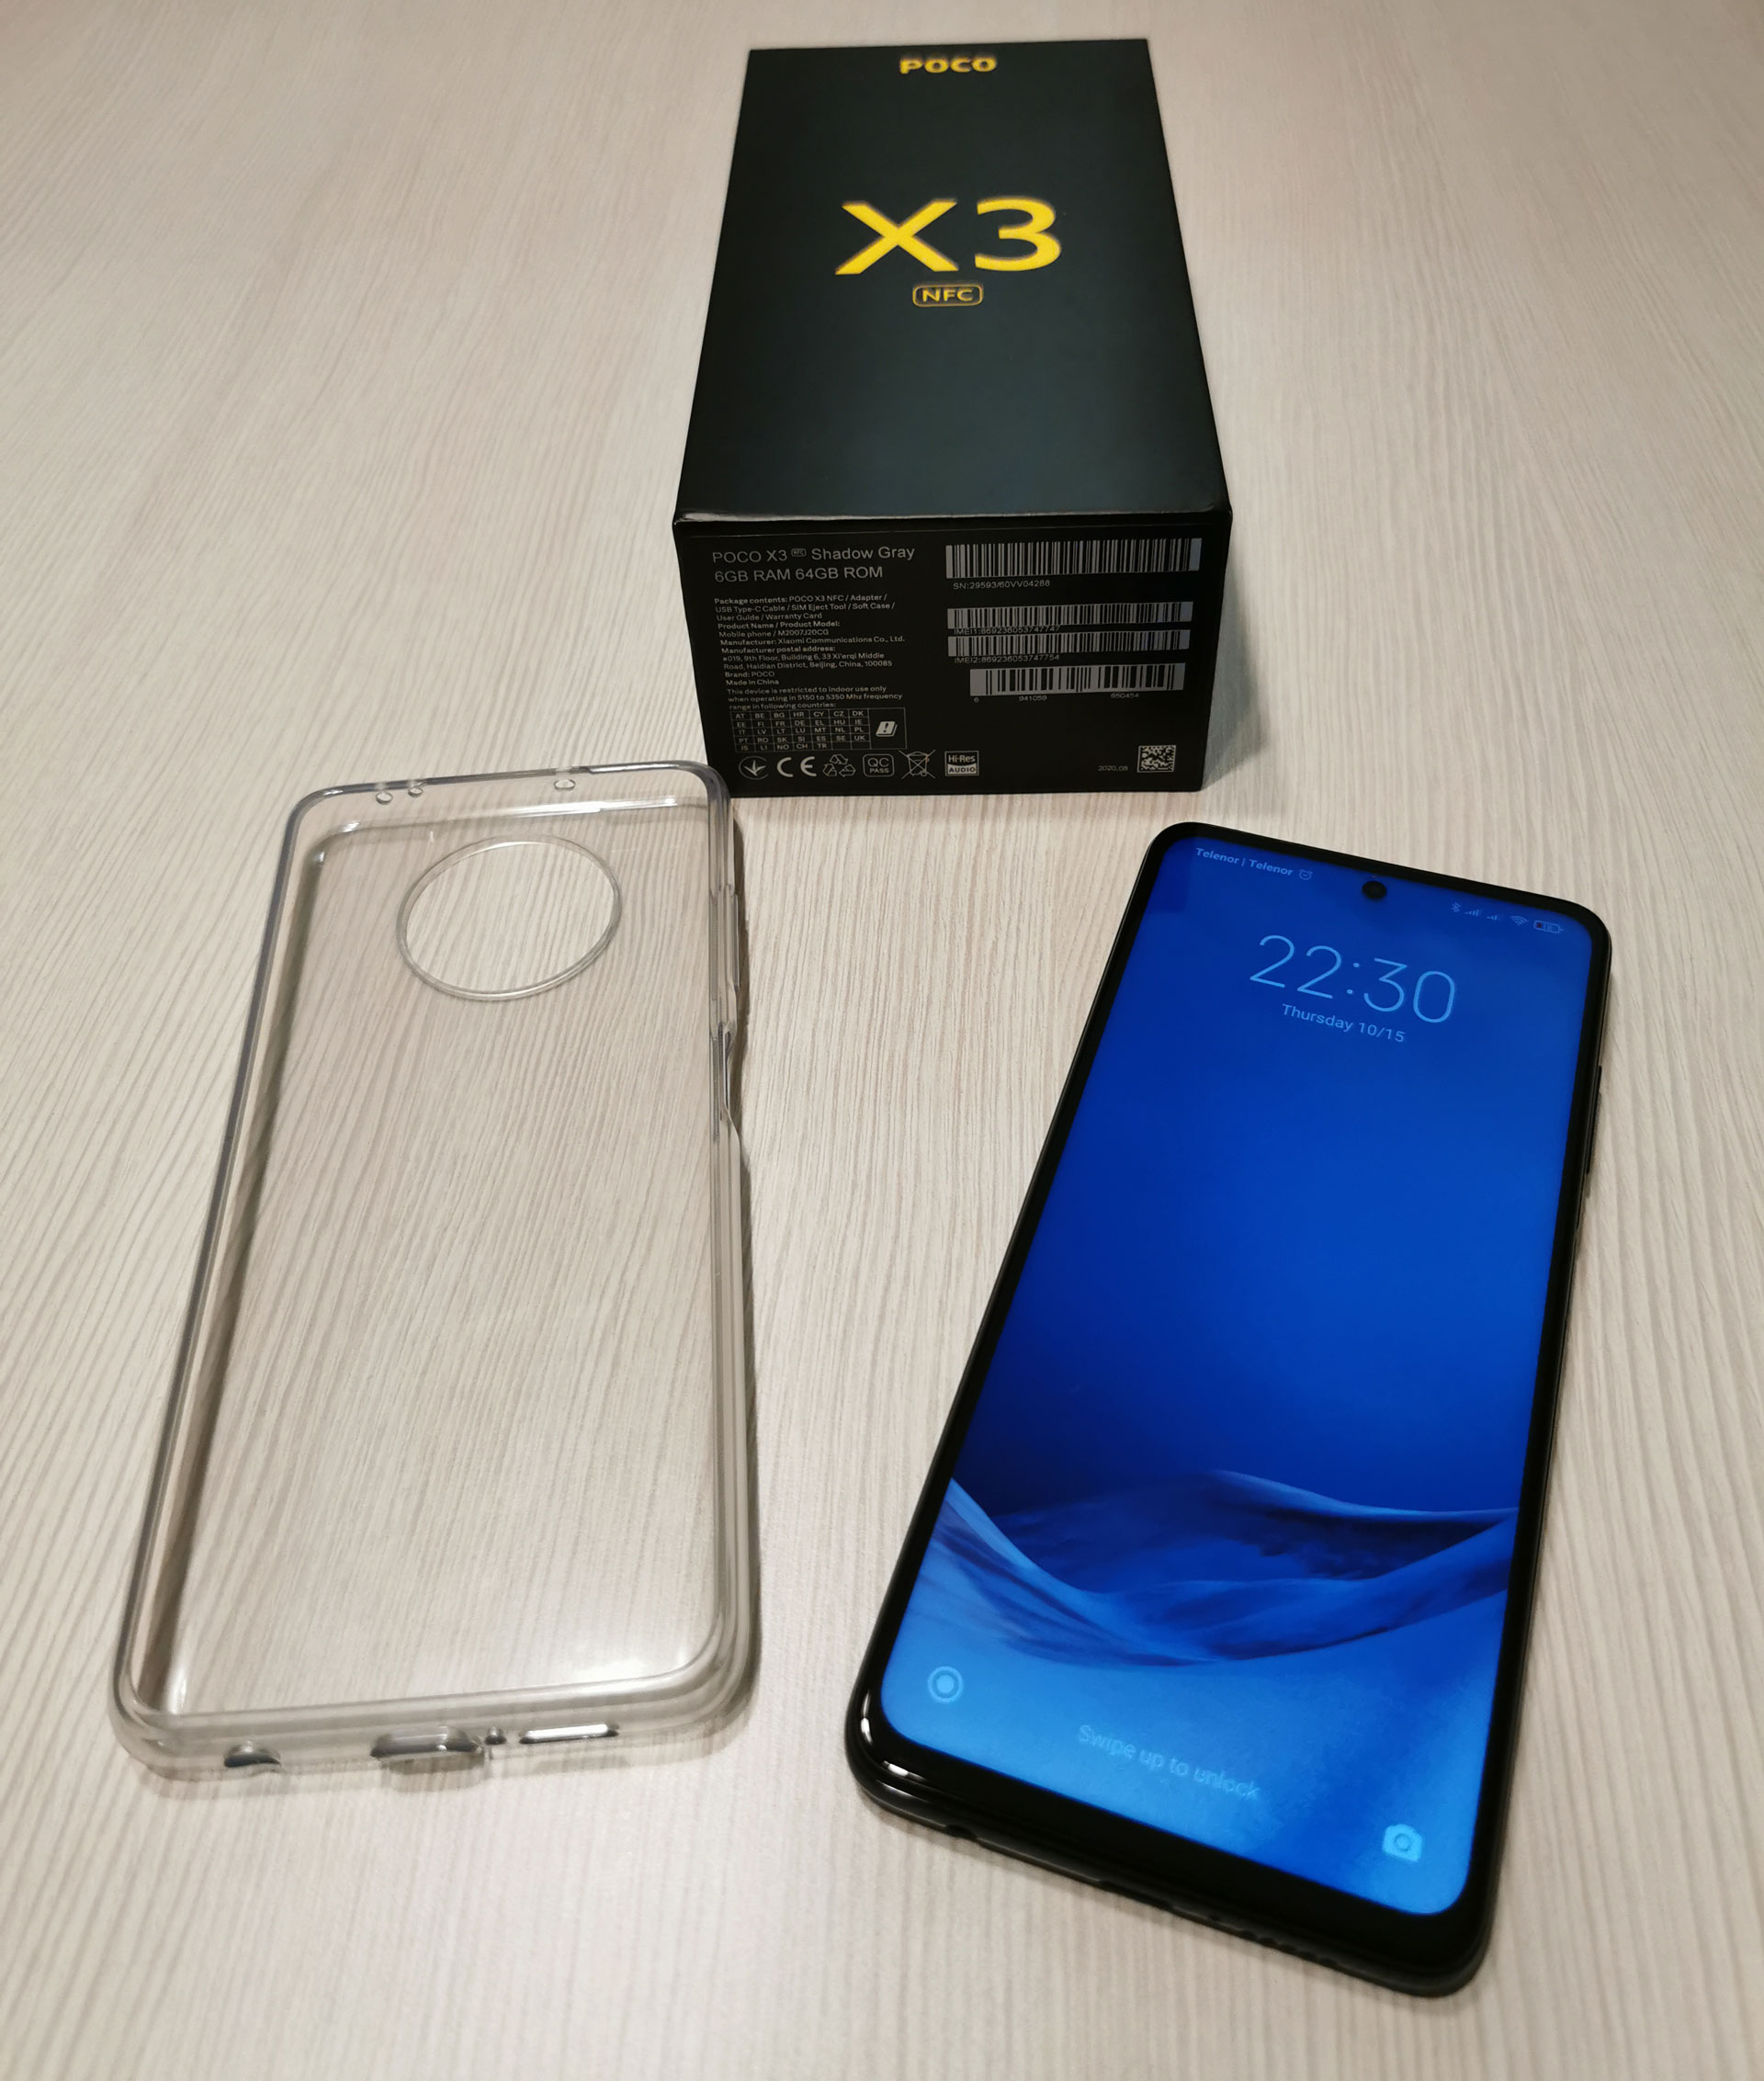 IMG 20201015 223046 REVIEW: Poco X3 NFC